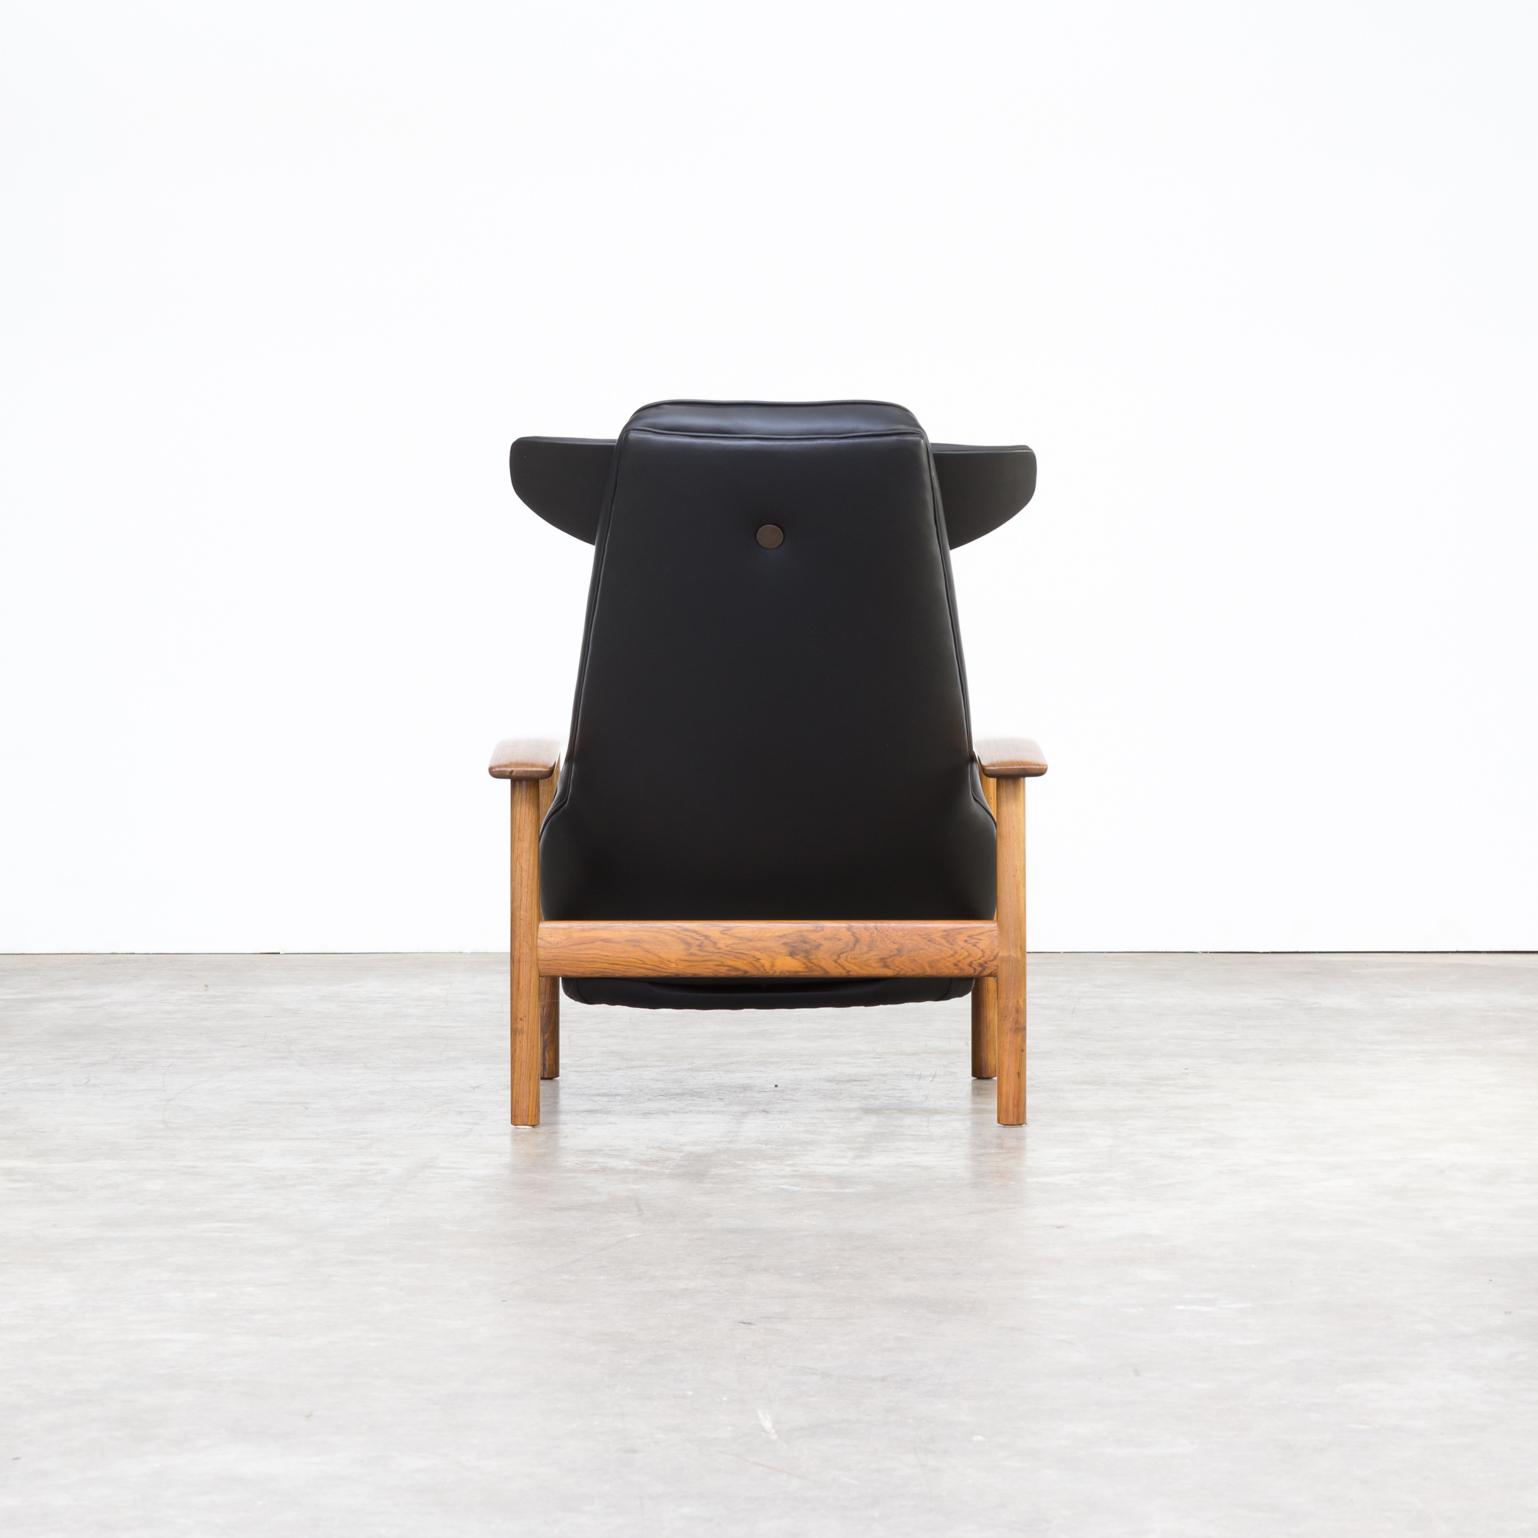 0503108ZF-sven-ivar-dysthe-dokka-mobler-norway-lounge-fauteuil-chairs-relax-restored-upholstered-restaurated-pirelli-vintage-retro-design-barbmama-7-van-15.jpg